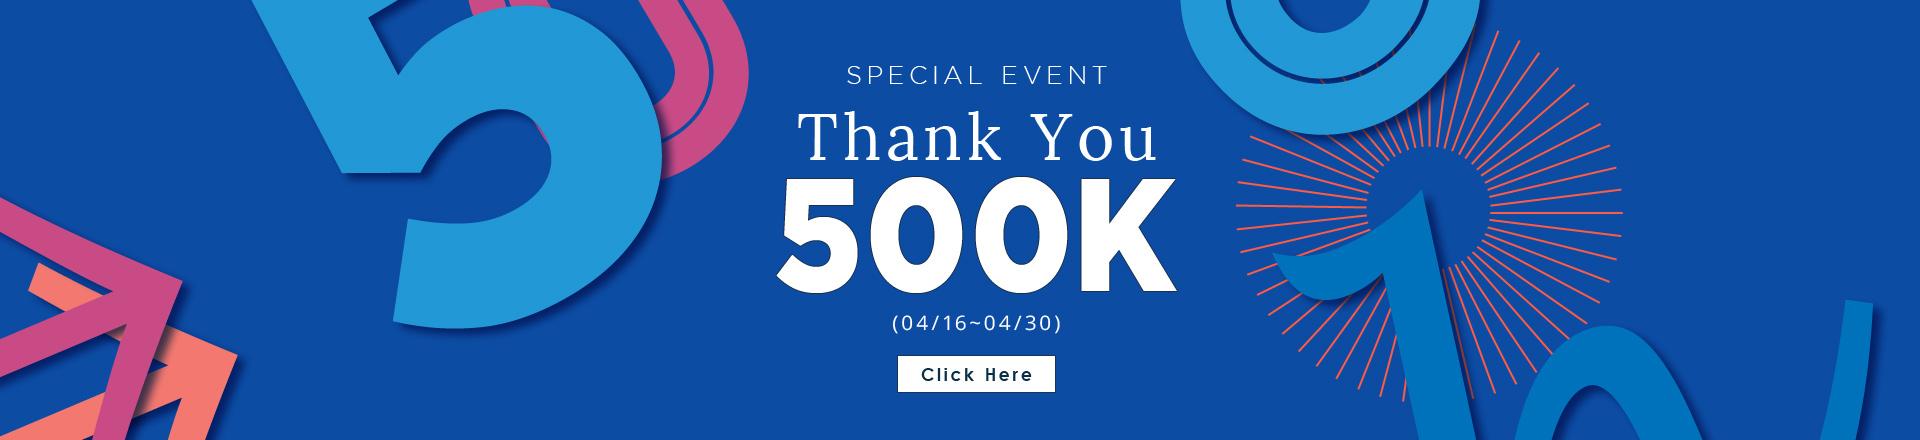 Thank you 500K